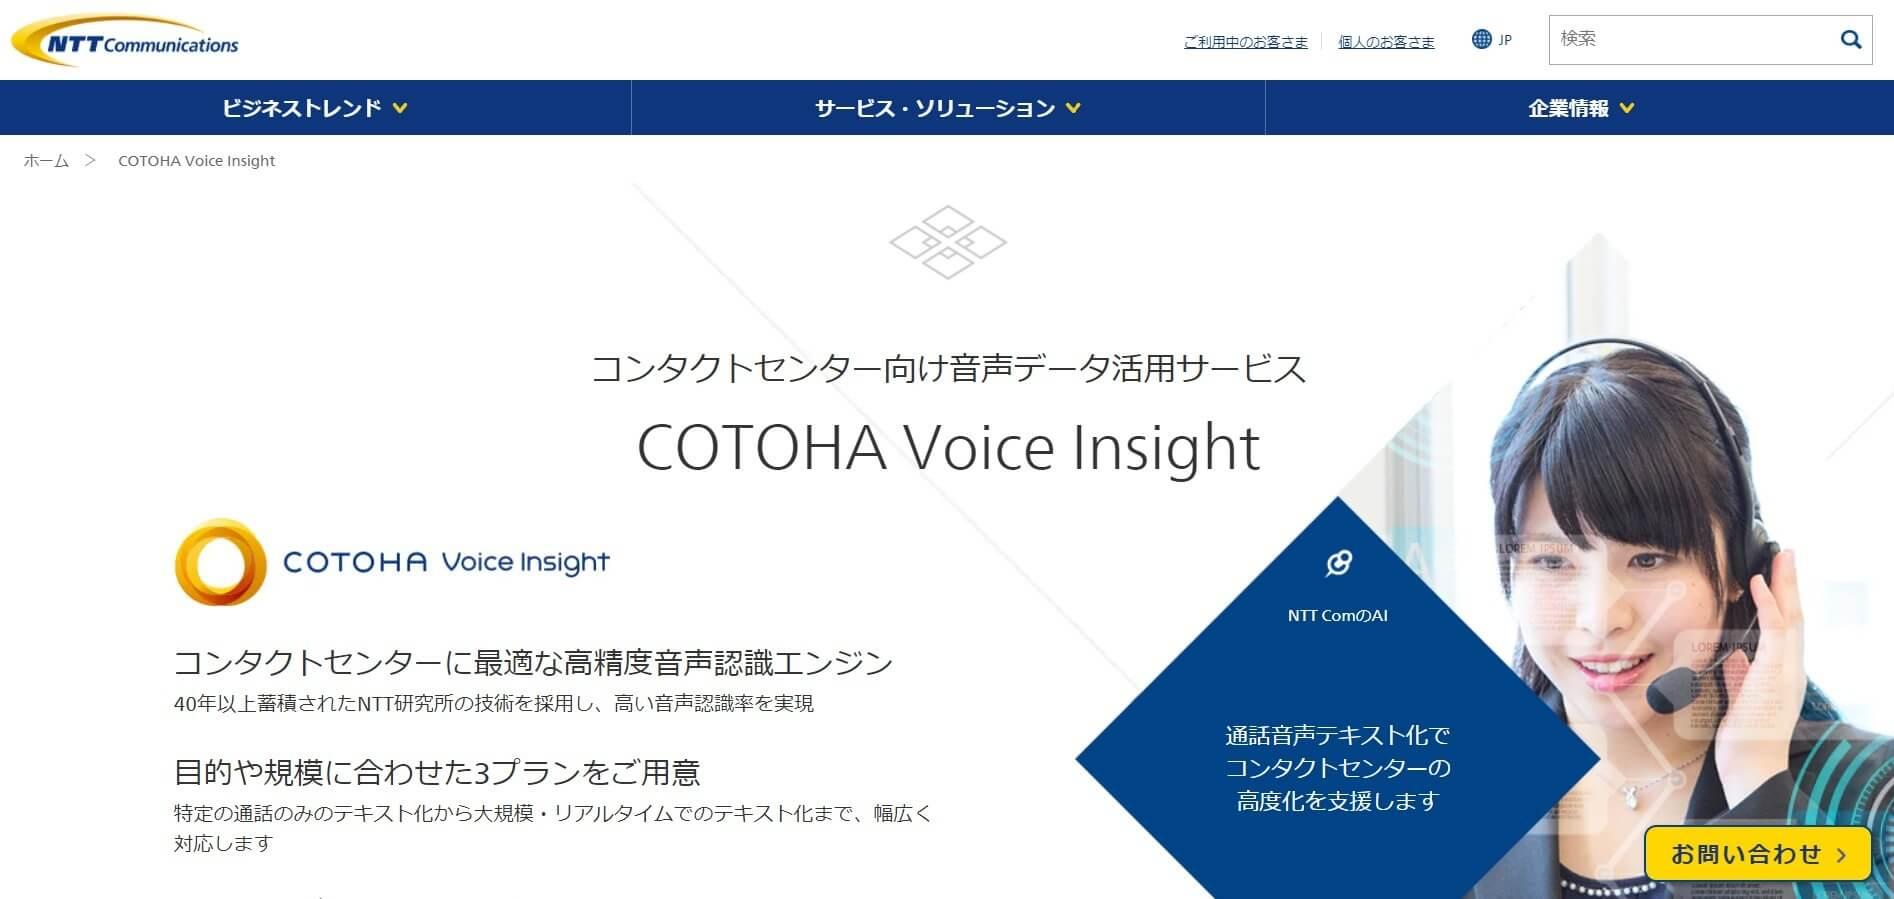 COTOHA Voice Insight(NTTコミュニケーションズ株式会社)